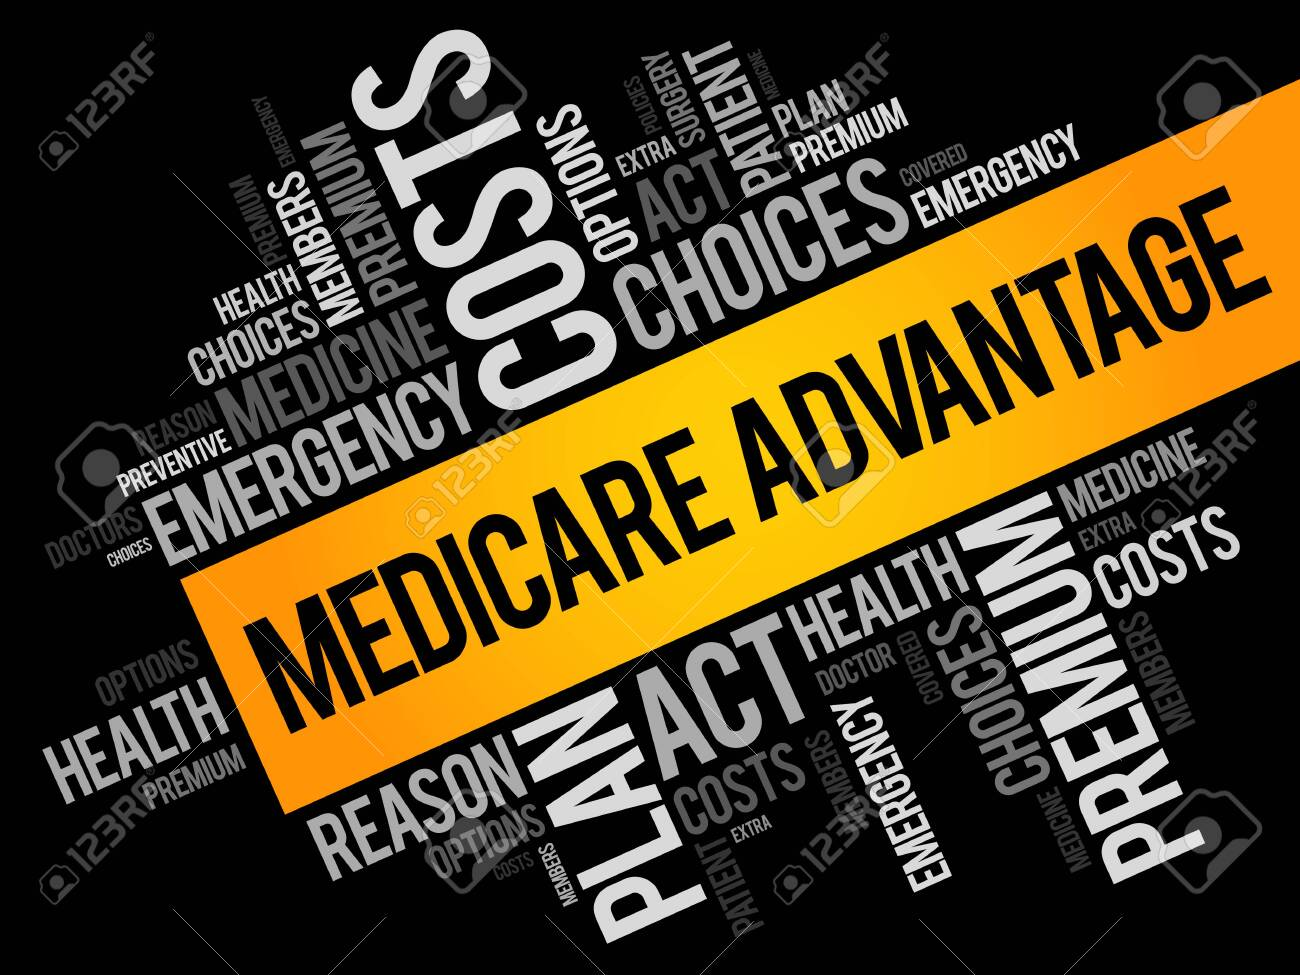 Medicare Advantage word cloud collage, health concept background - 121192685